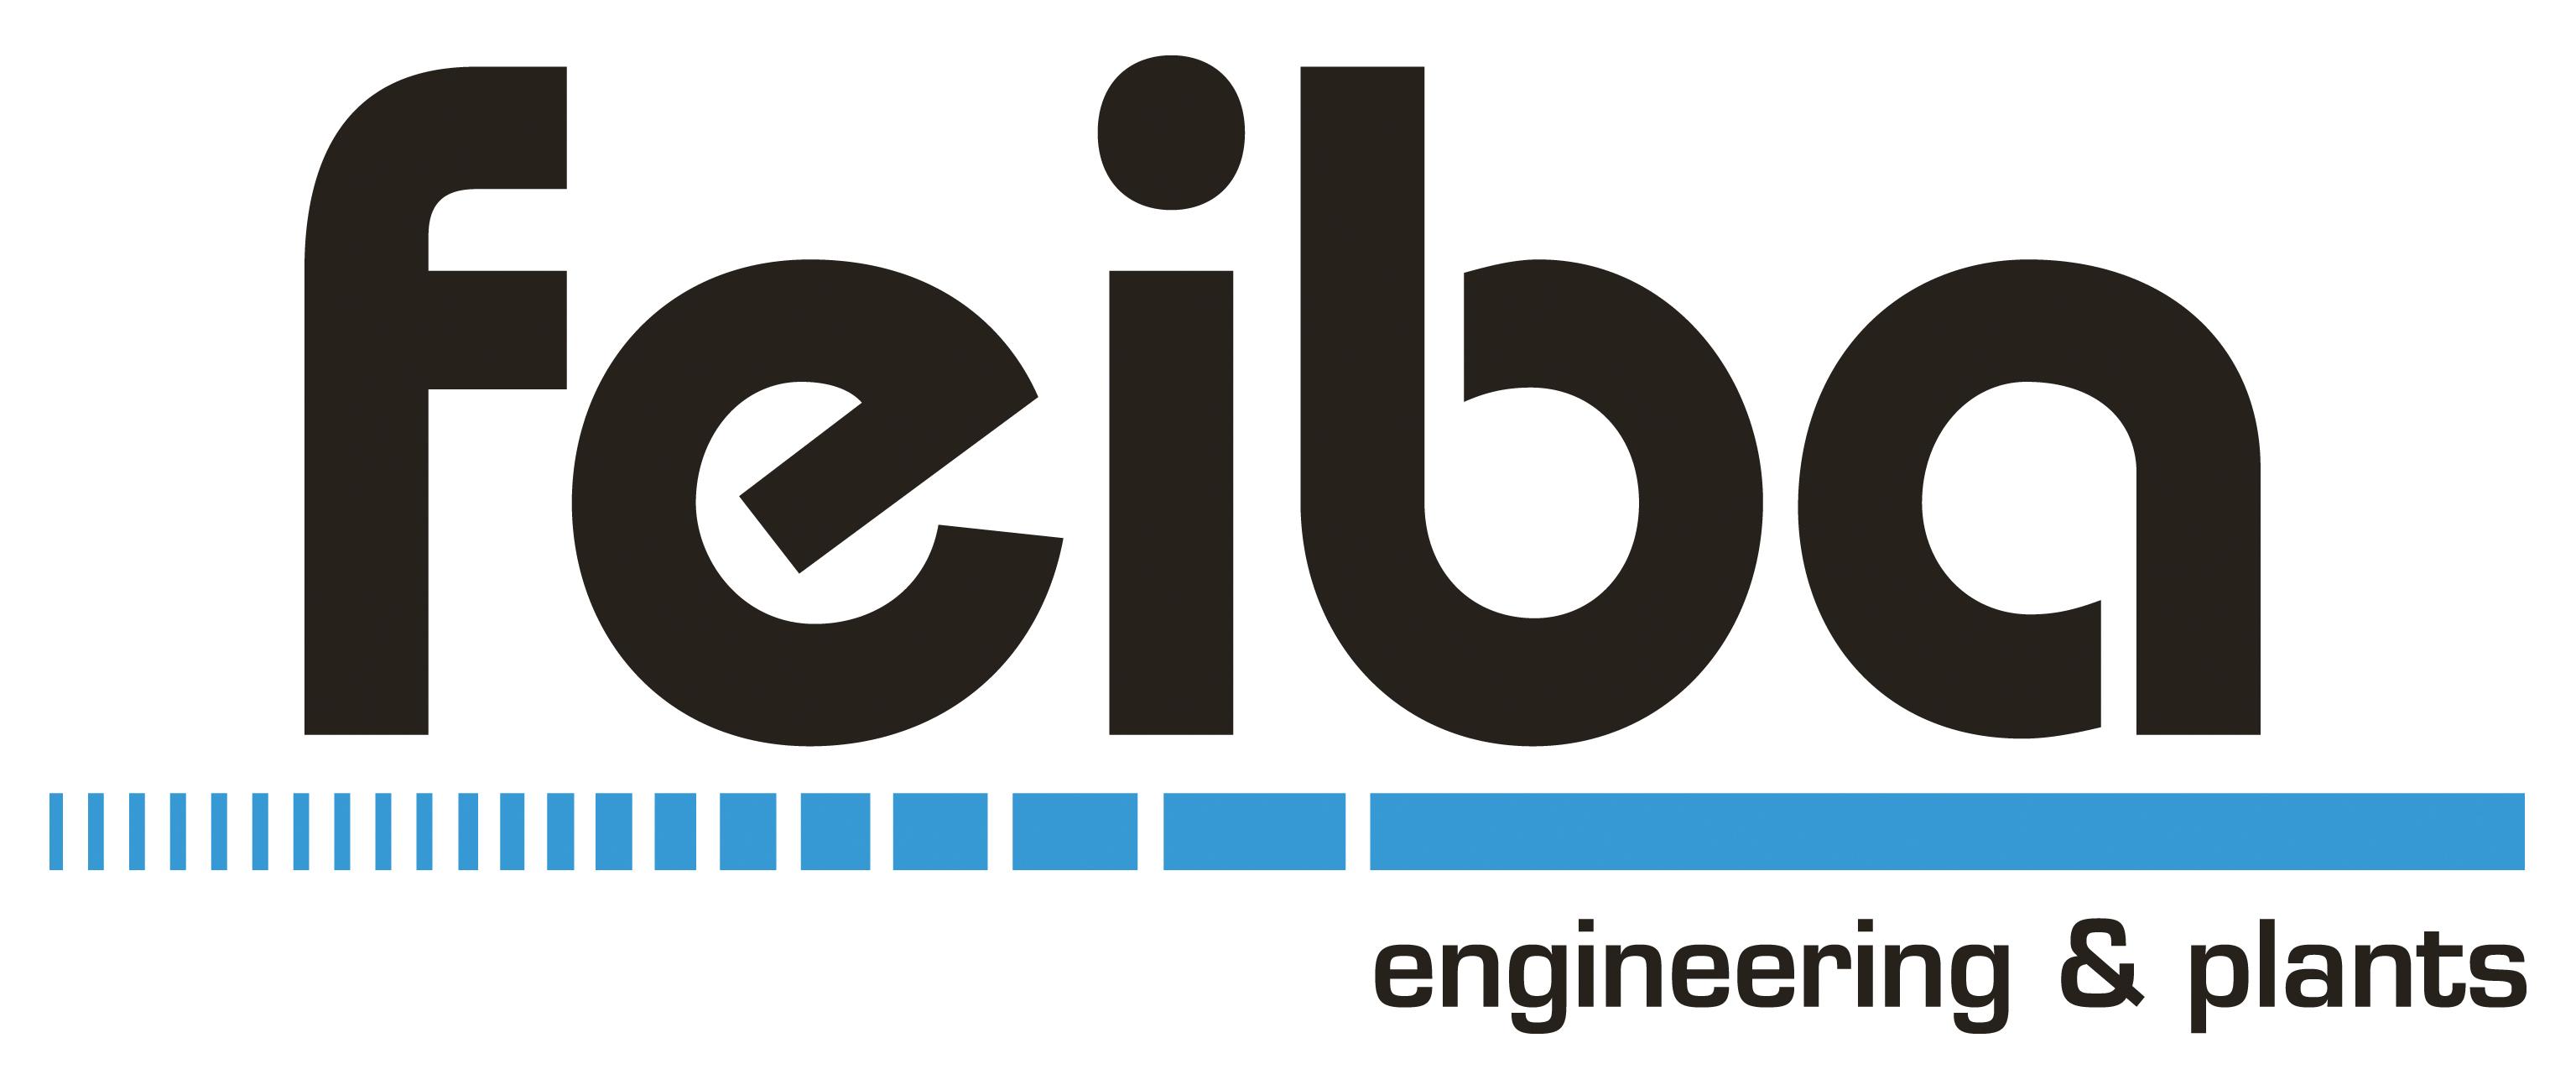 Feiba Engineering & Plants GmbH